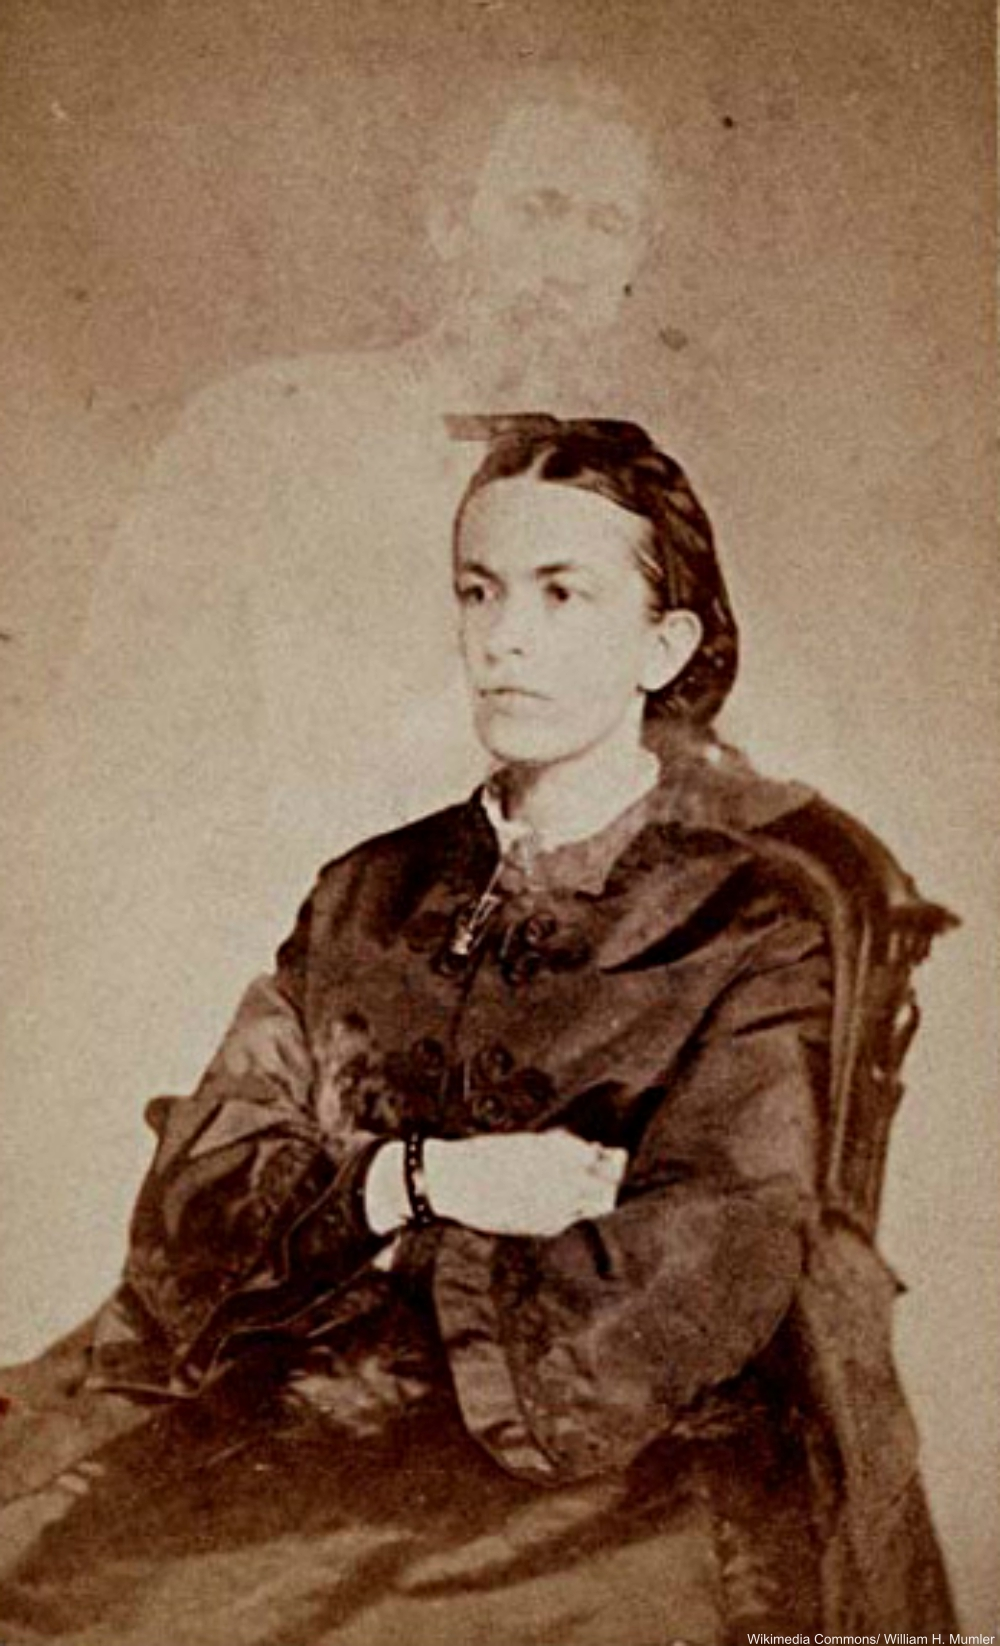 Spirit photography by known fraudster William Mumler, 1868